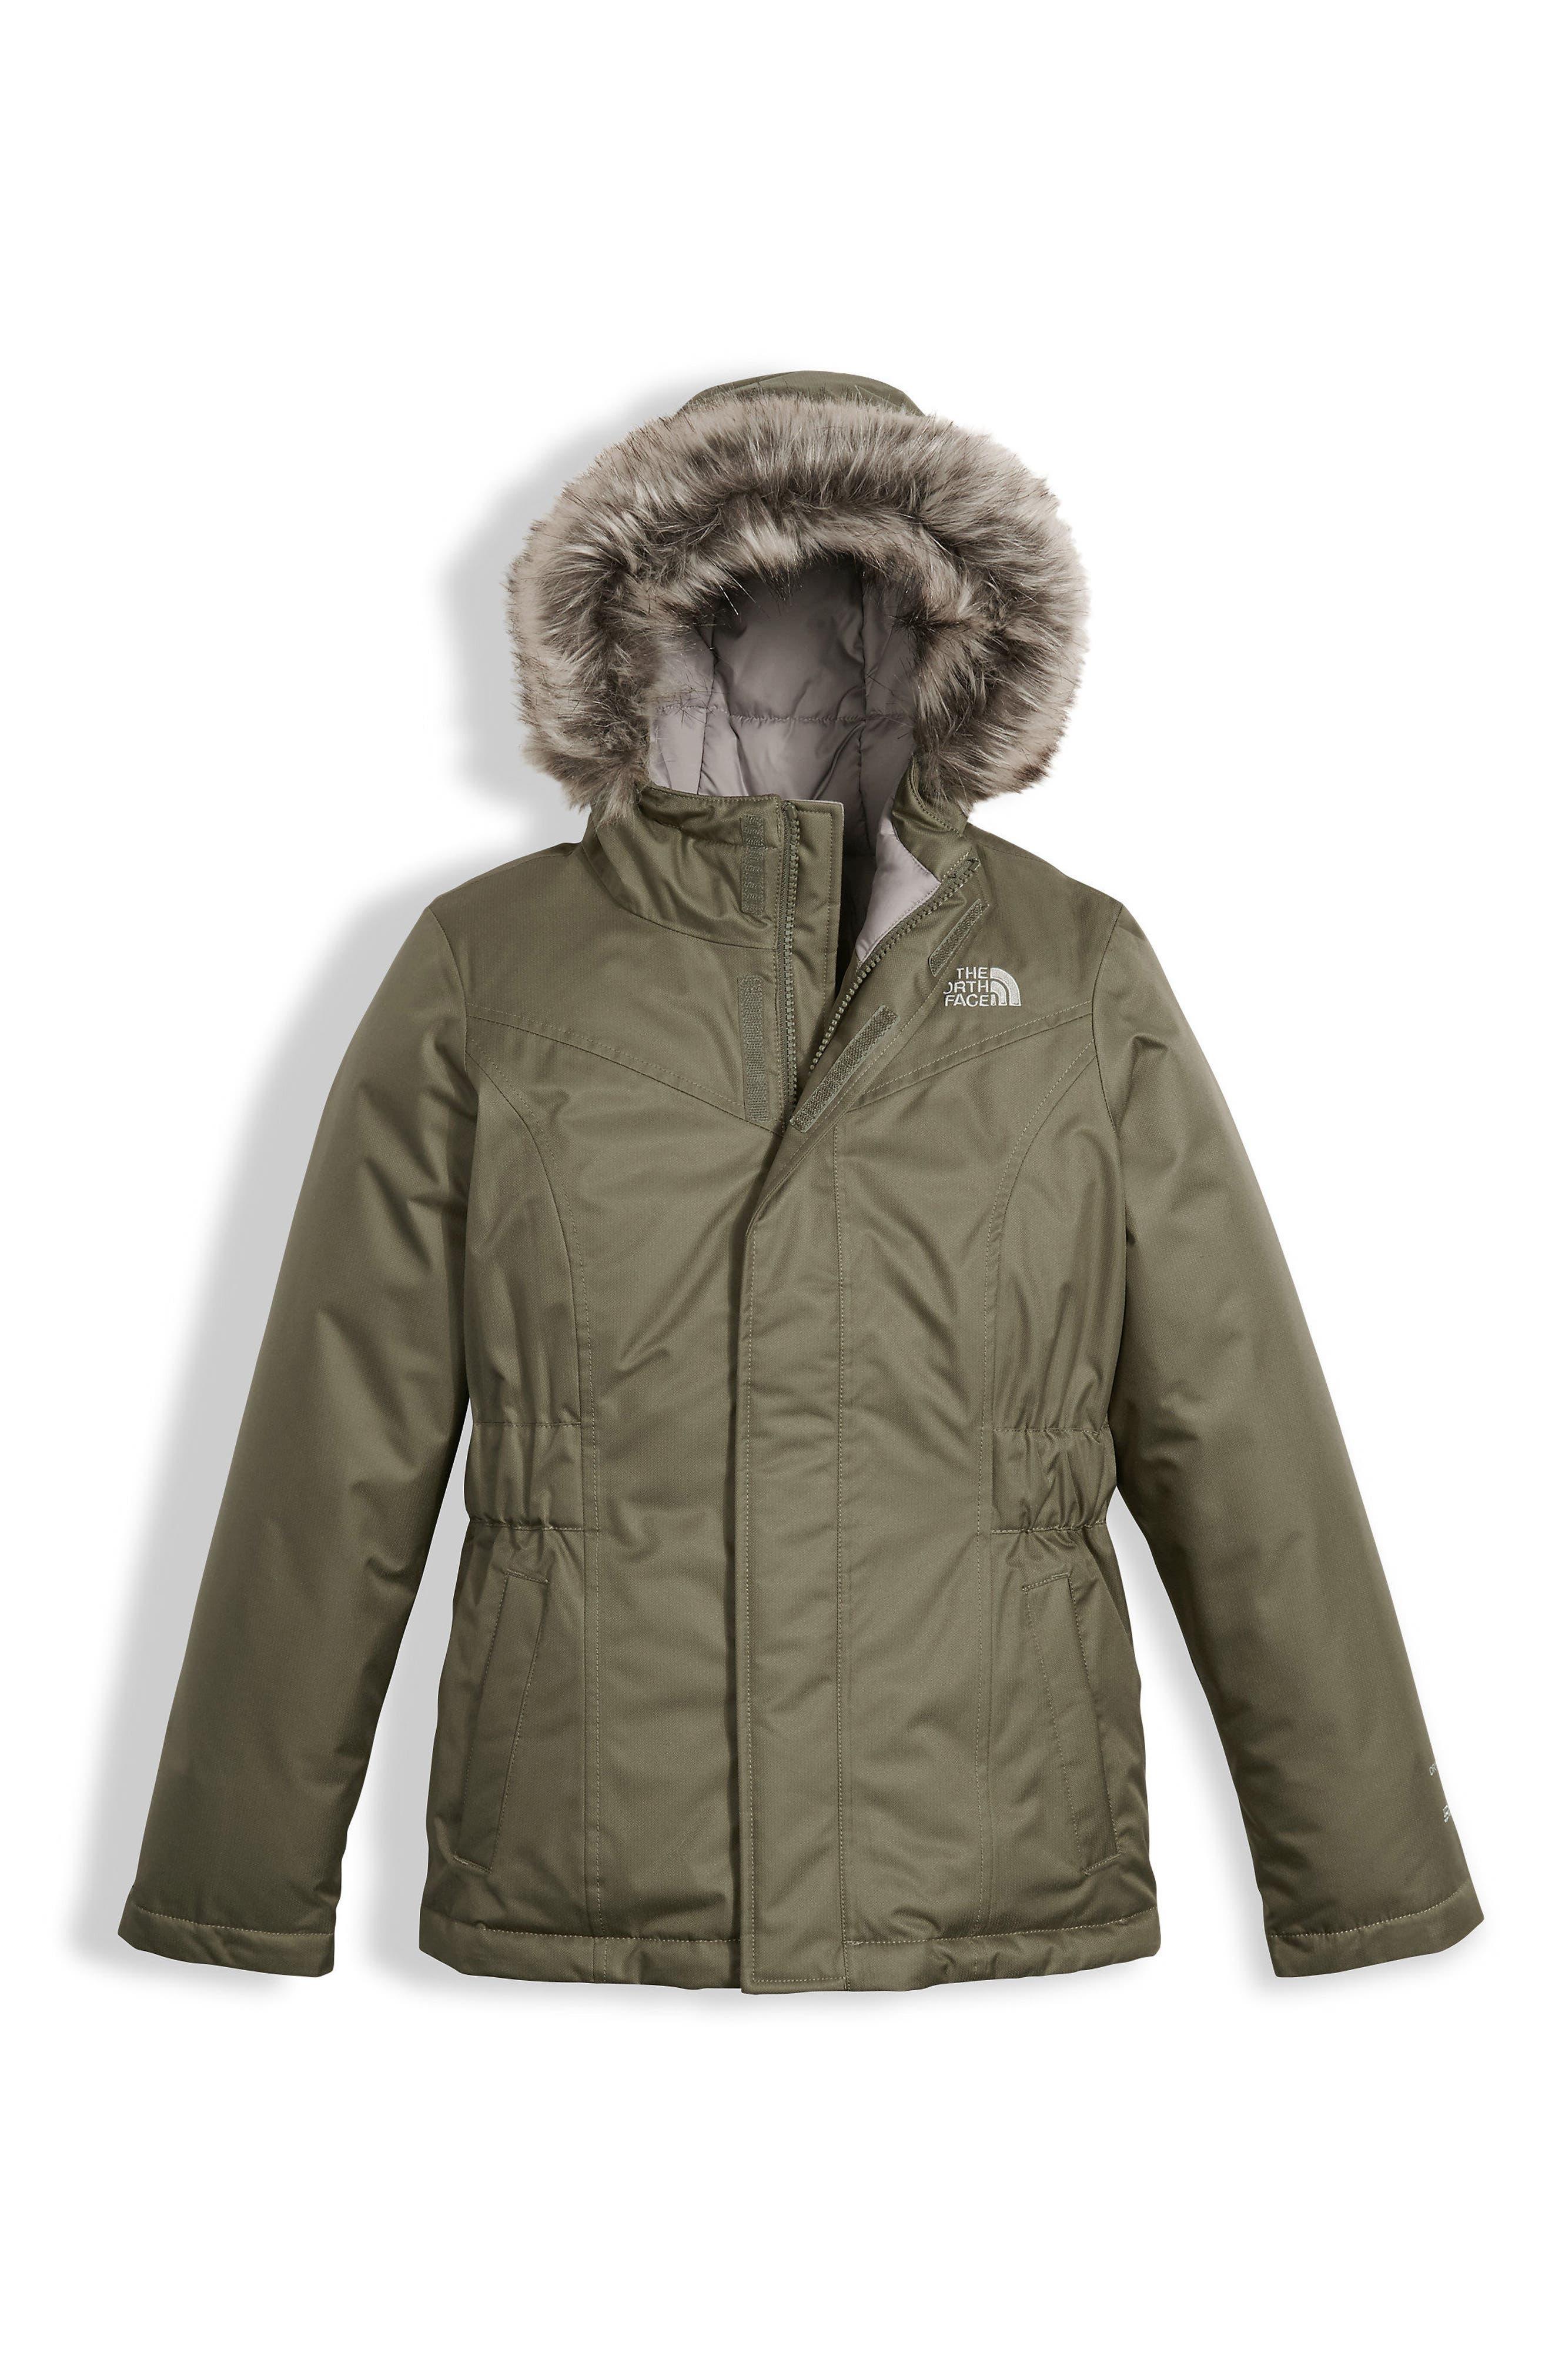 Greenland Waterproof 550-Fill Down Jacket,                             Main thumbnail 1, color,                             Burnt Olive Green